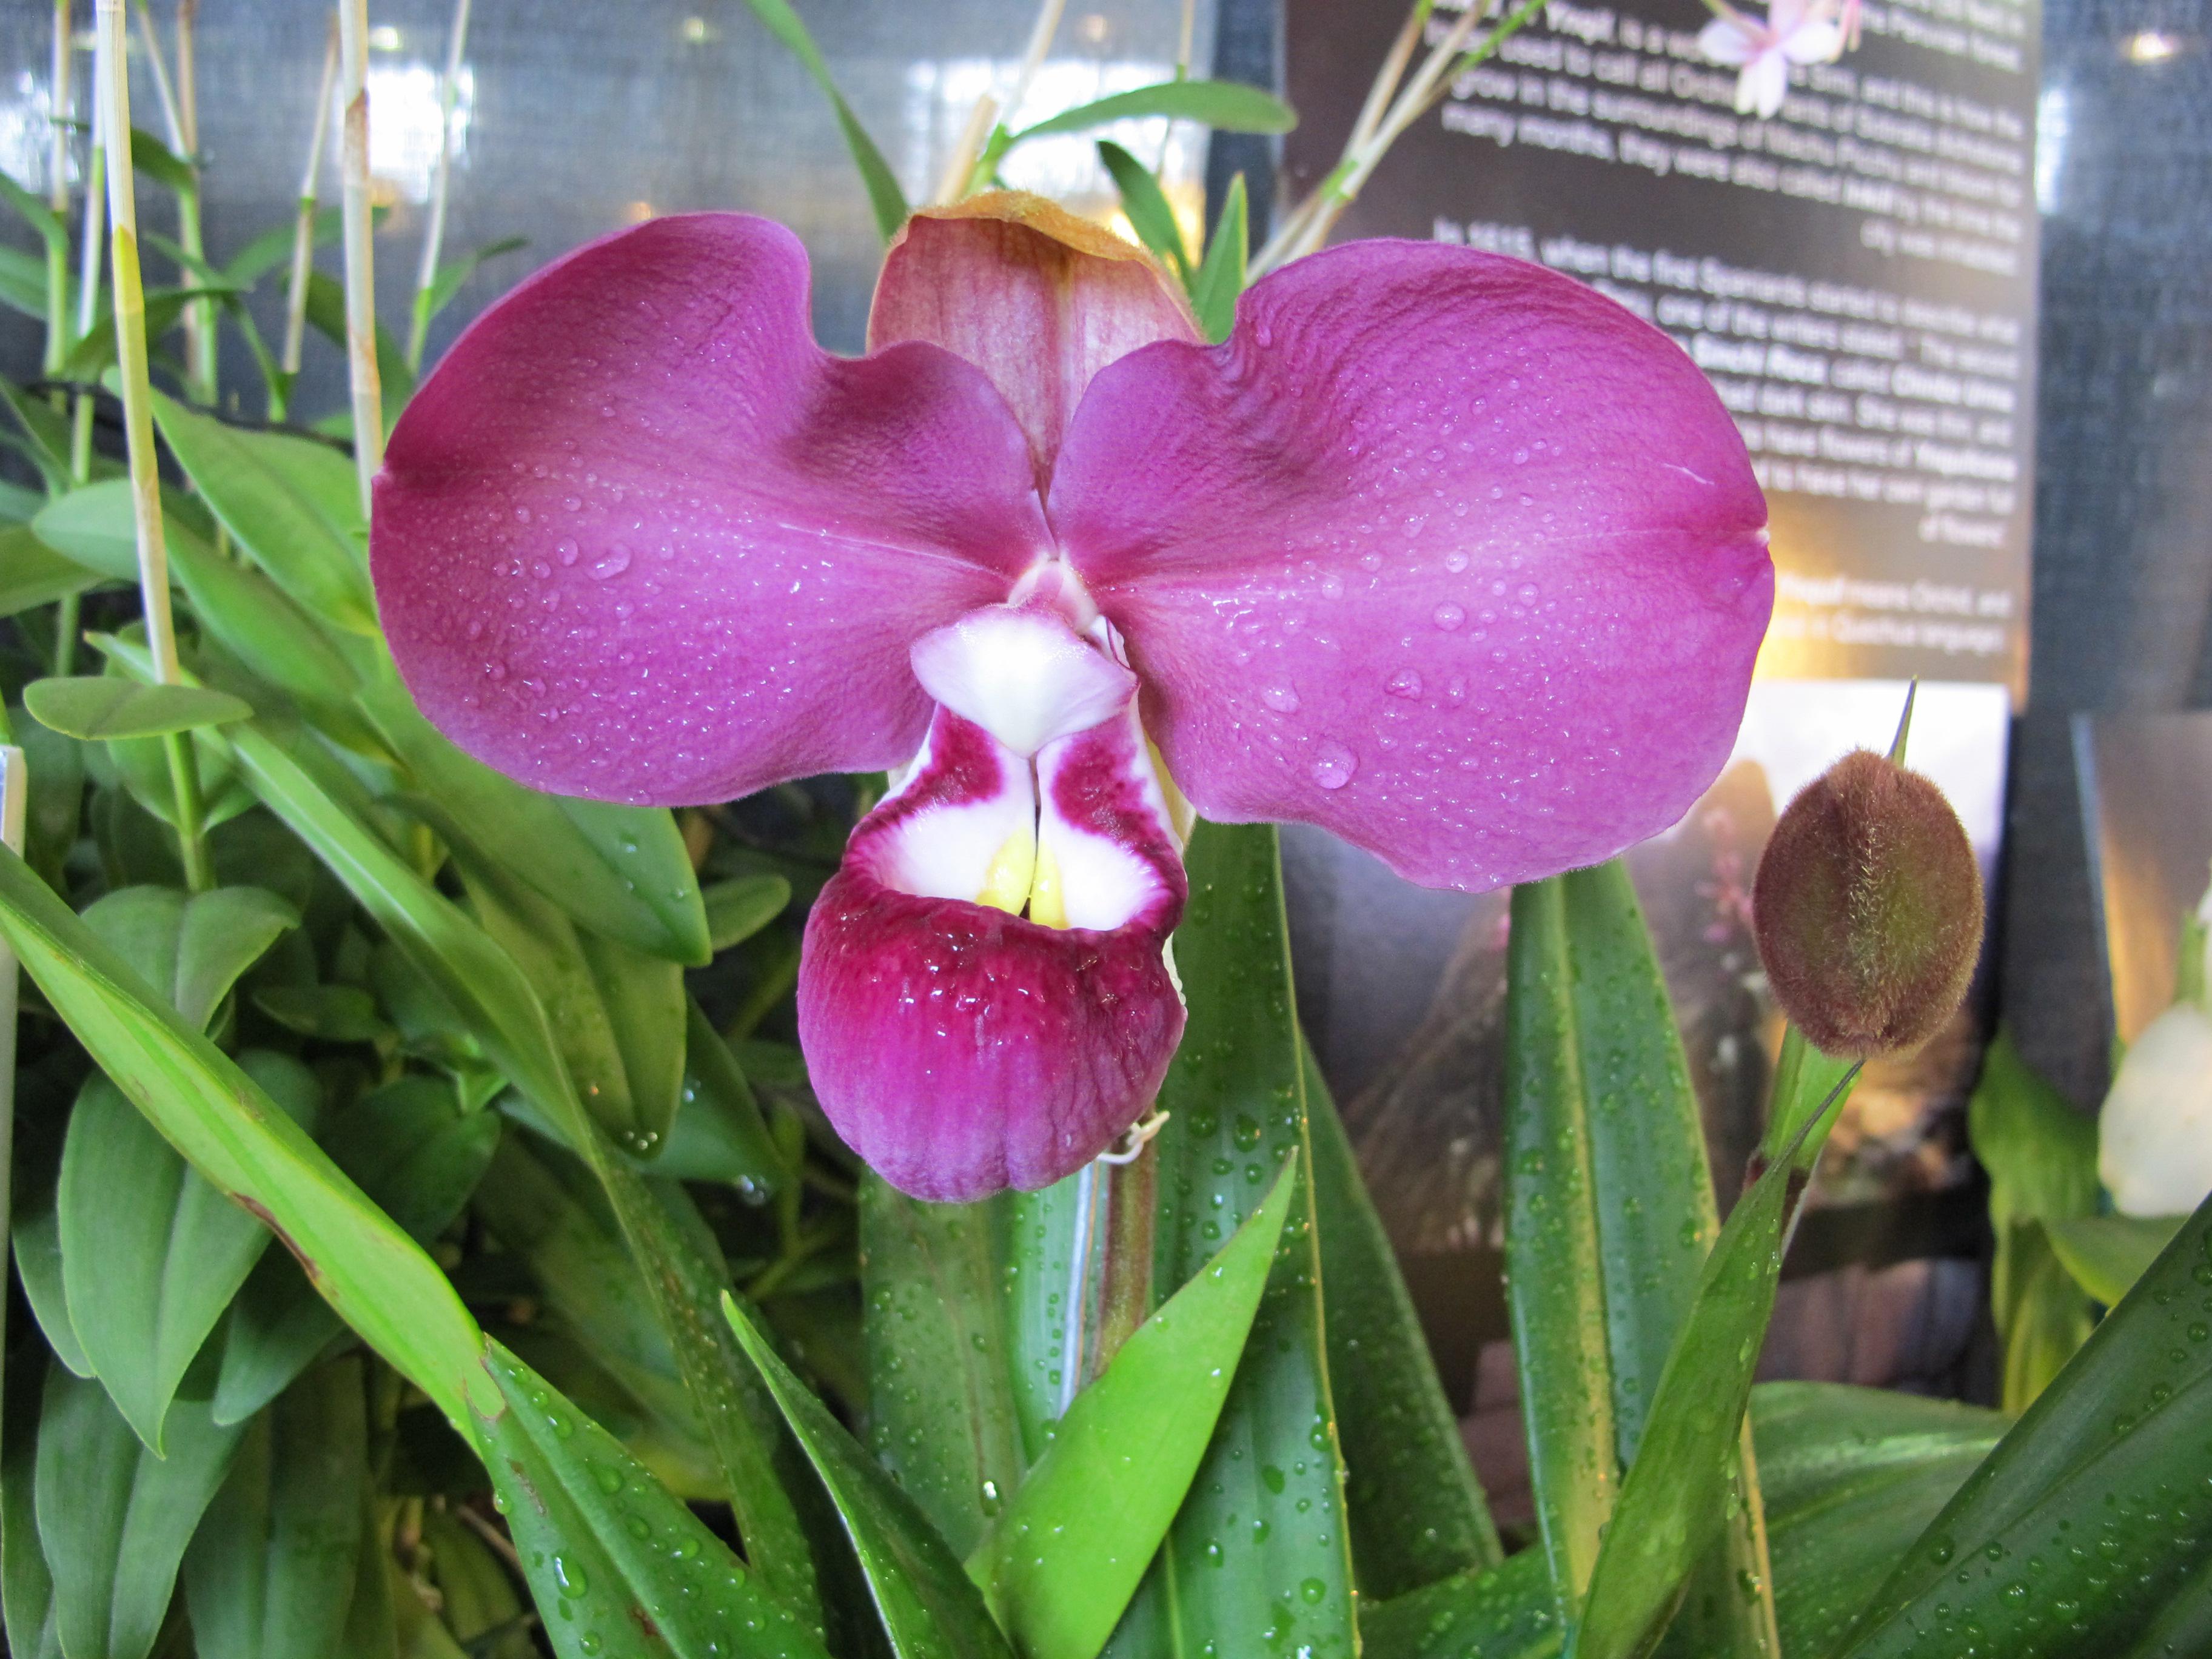 File:Phragmipedium kovachii - Flickr 003.jpg - Wikimedia Commons